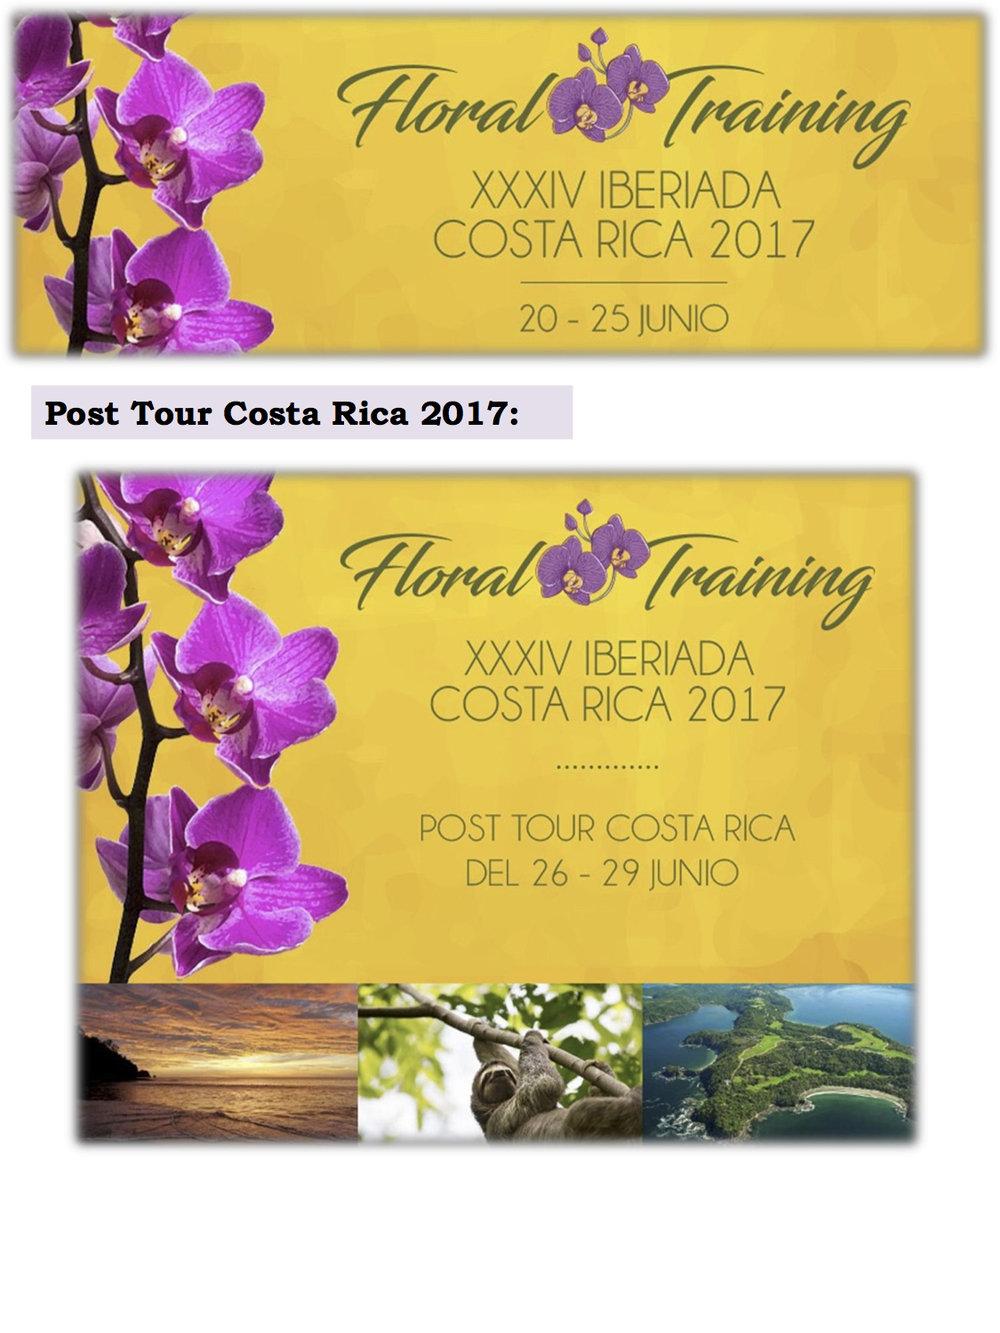 Floral Training - XXXIV Iberiada Costa Rica 2017 (English) 11.jpg